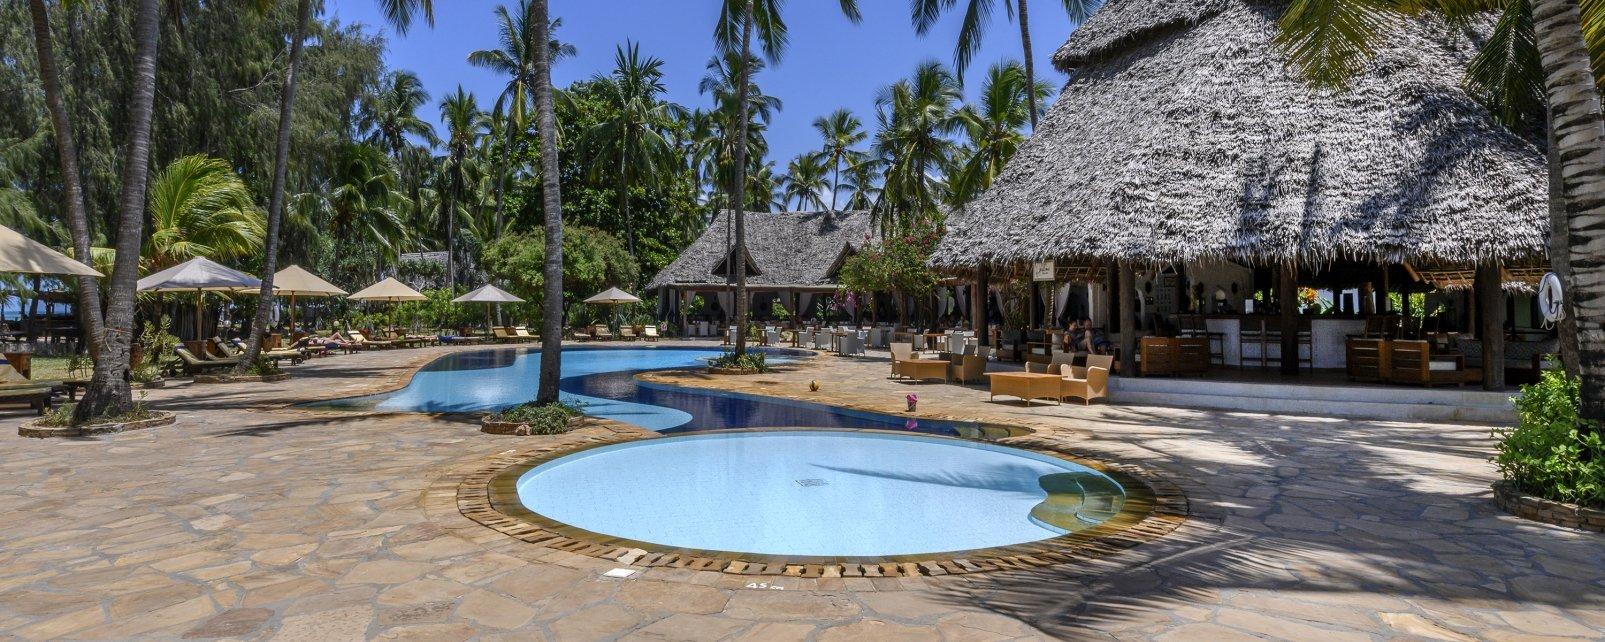 Hôtel Bluebay Beach Resort Spa